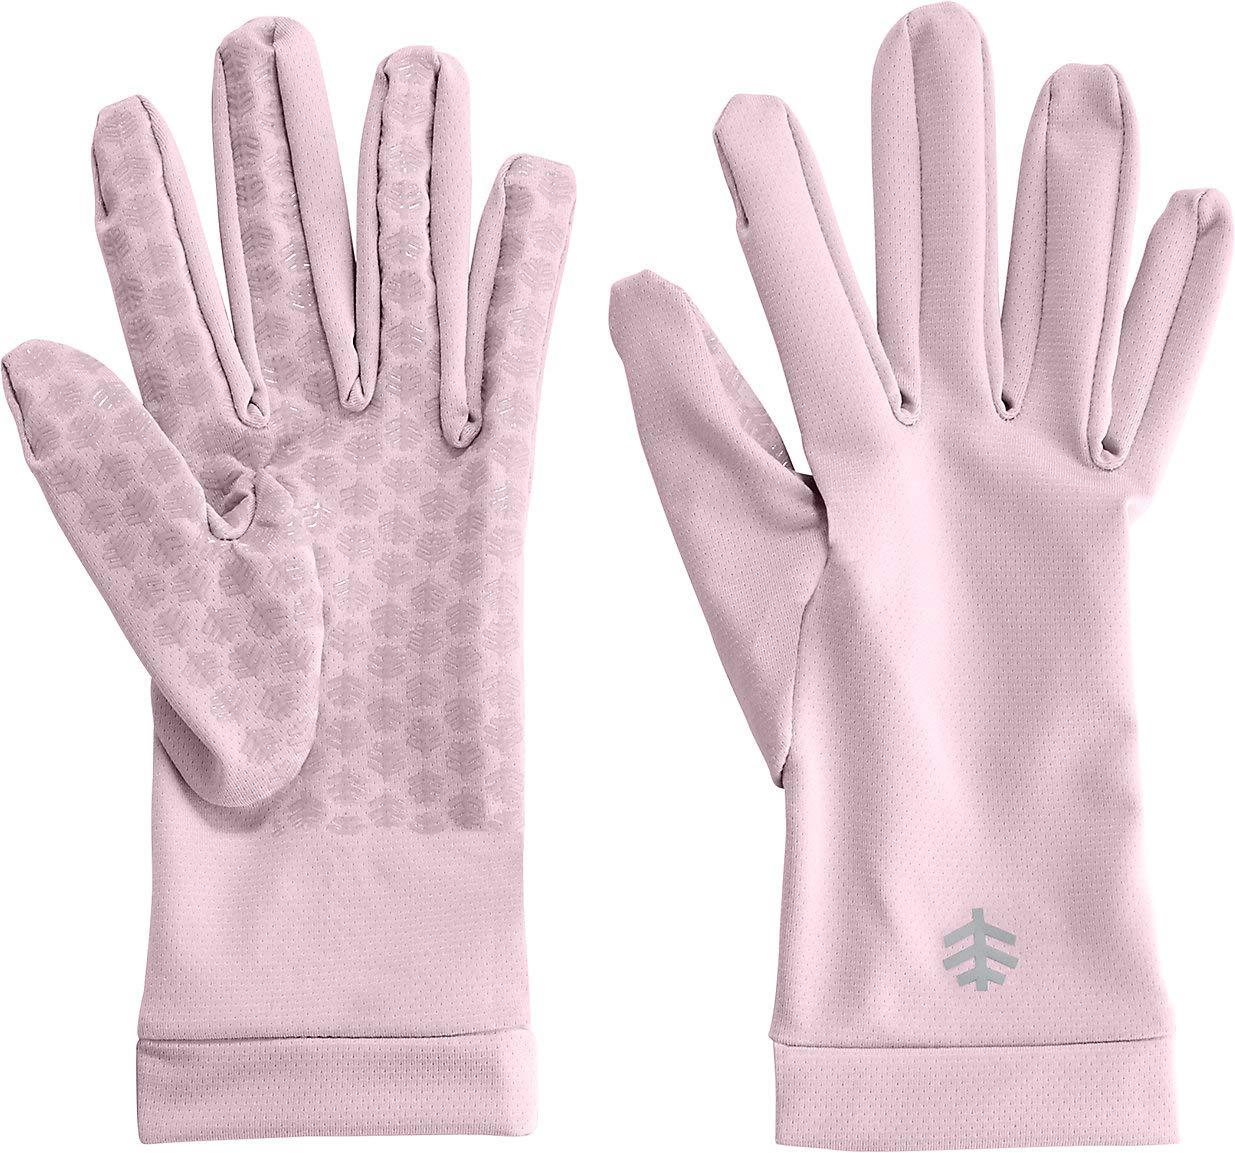 Coolibar UPF 50+ Unisex Sun Gloves - Sun Protective (X-Small- Dusty Mauve)